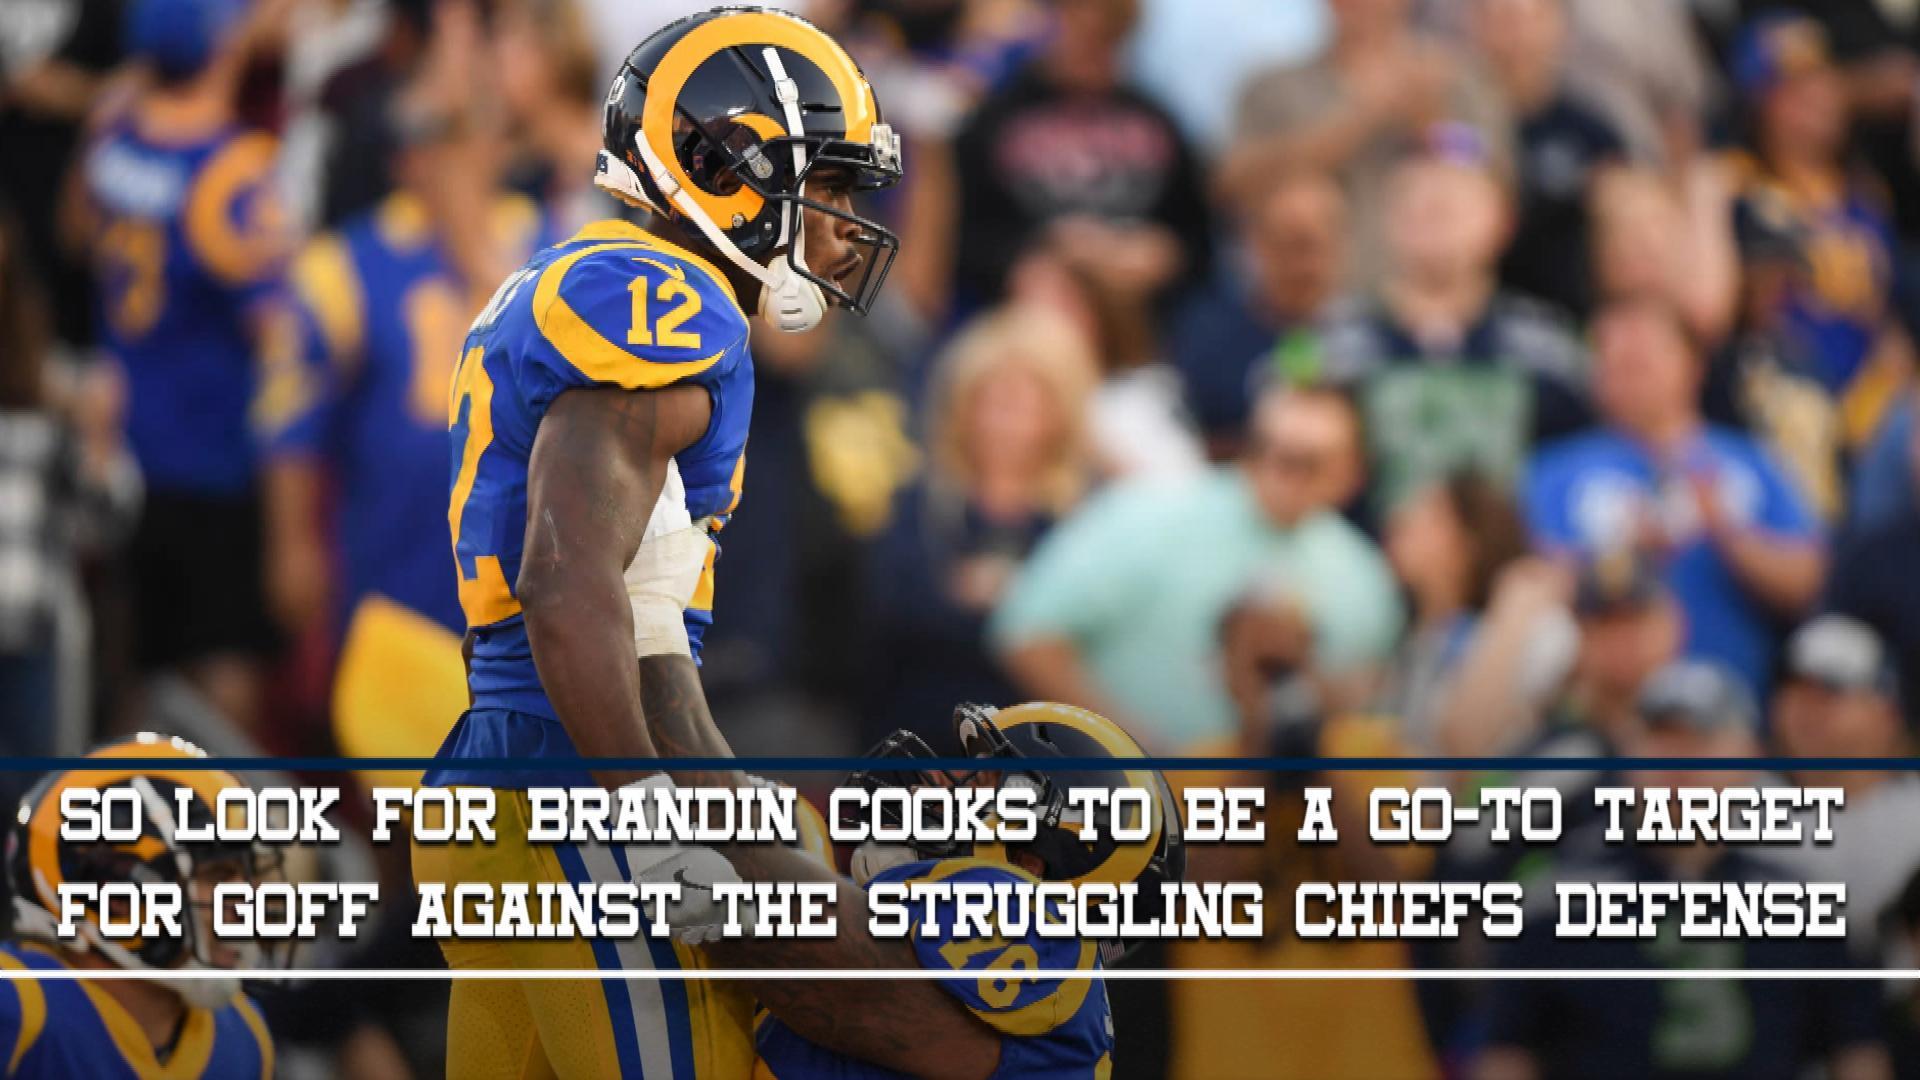 Brandin Cooks, Week 11 Fantasy Preview